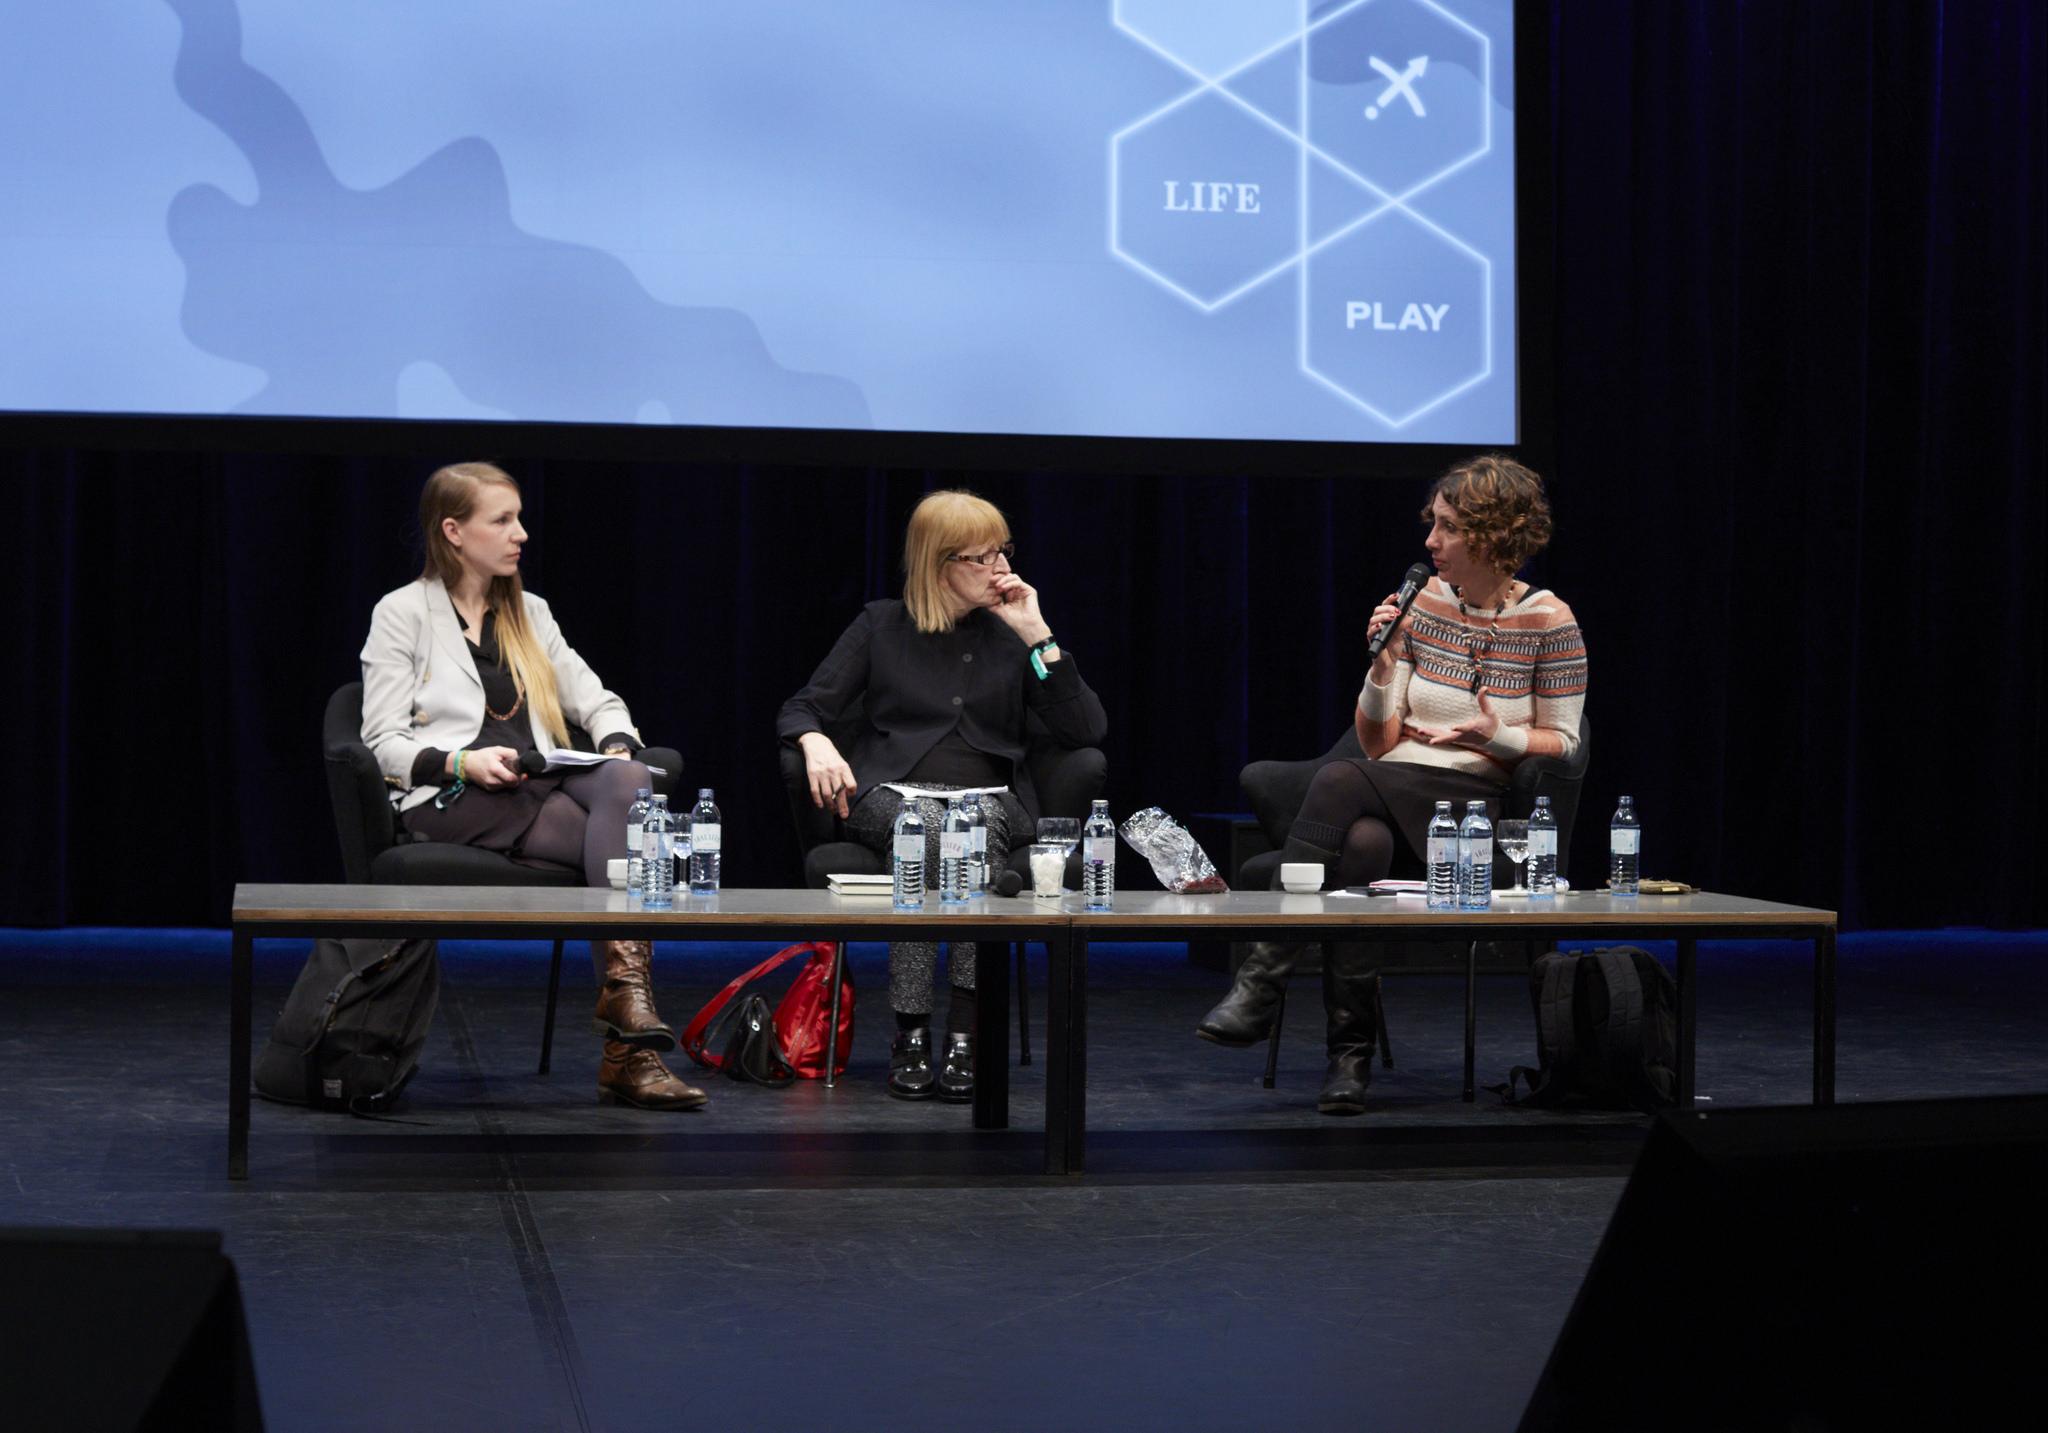 The work Keynote Panel